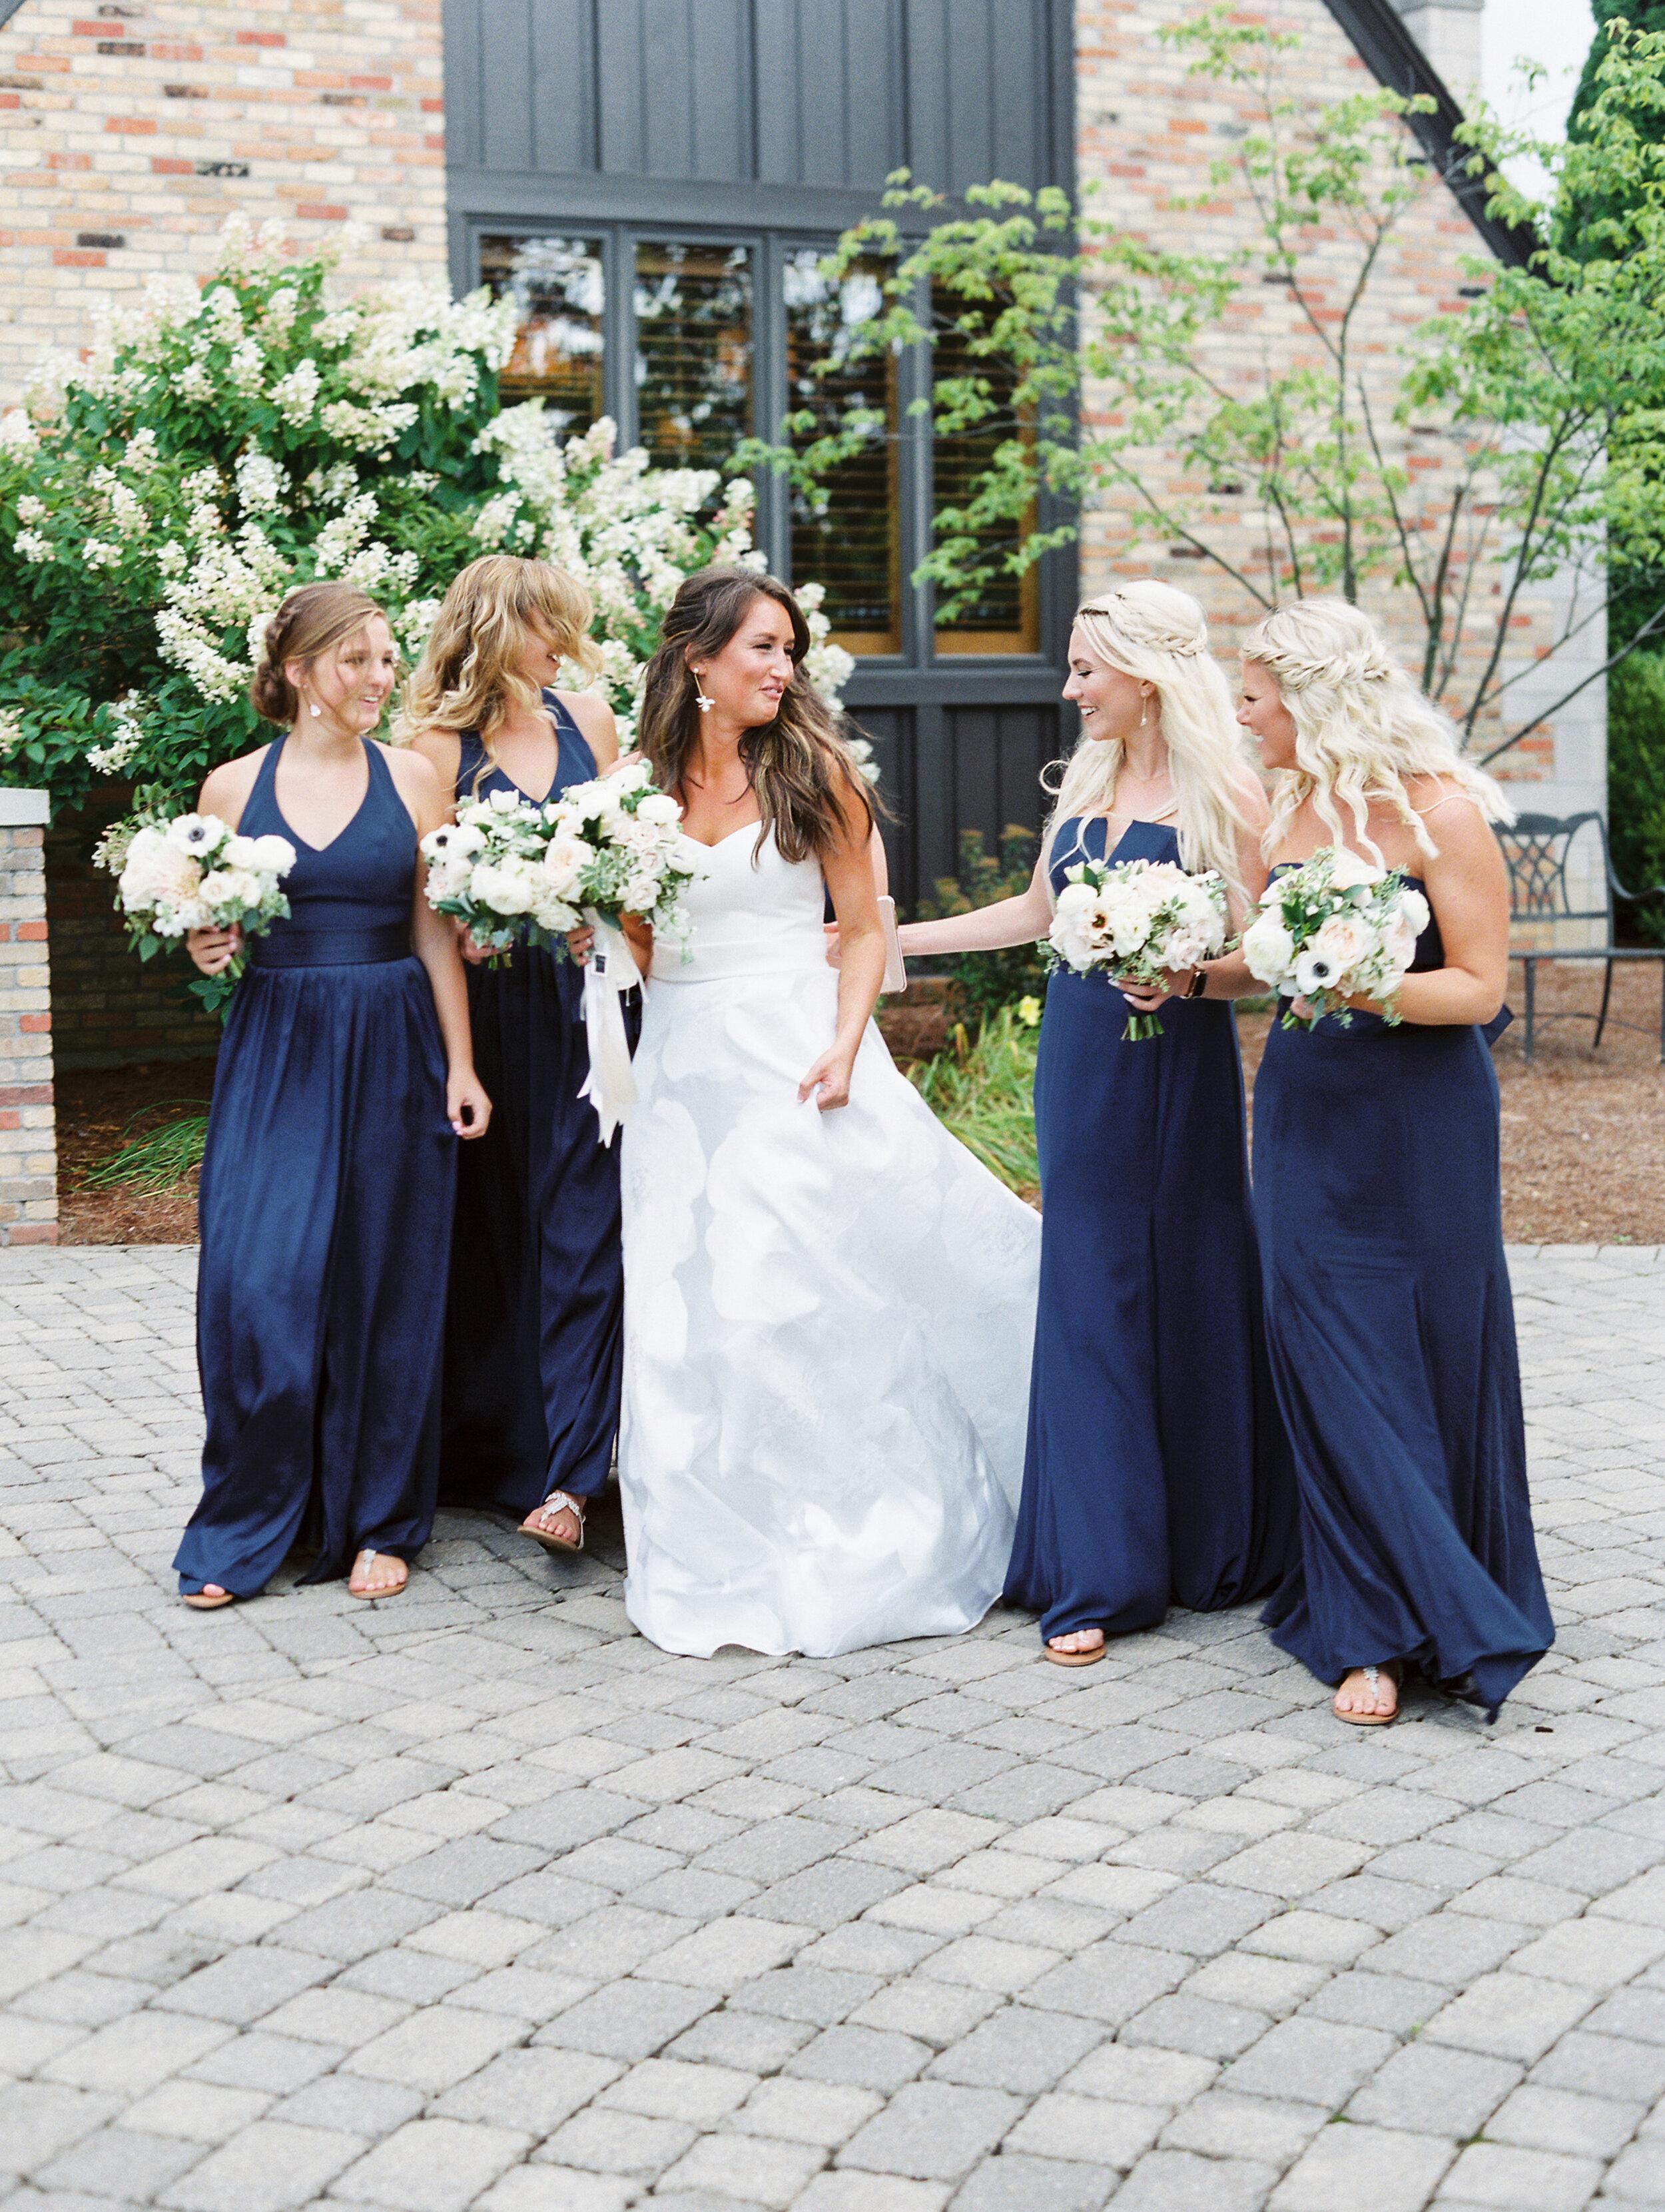 Kuiper+Wedding+Reception+Bridal+Party-111.jpg